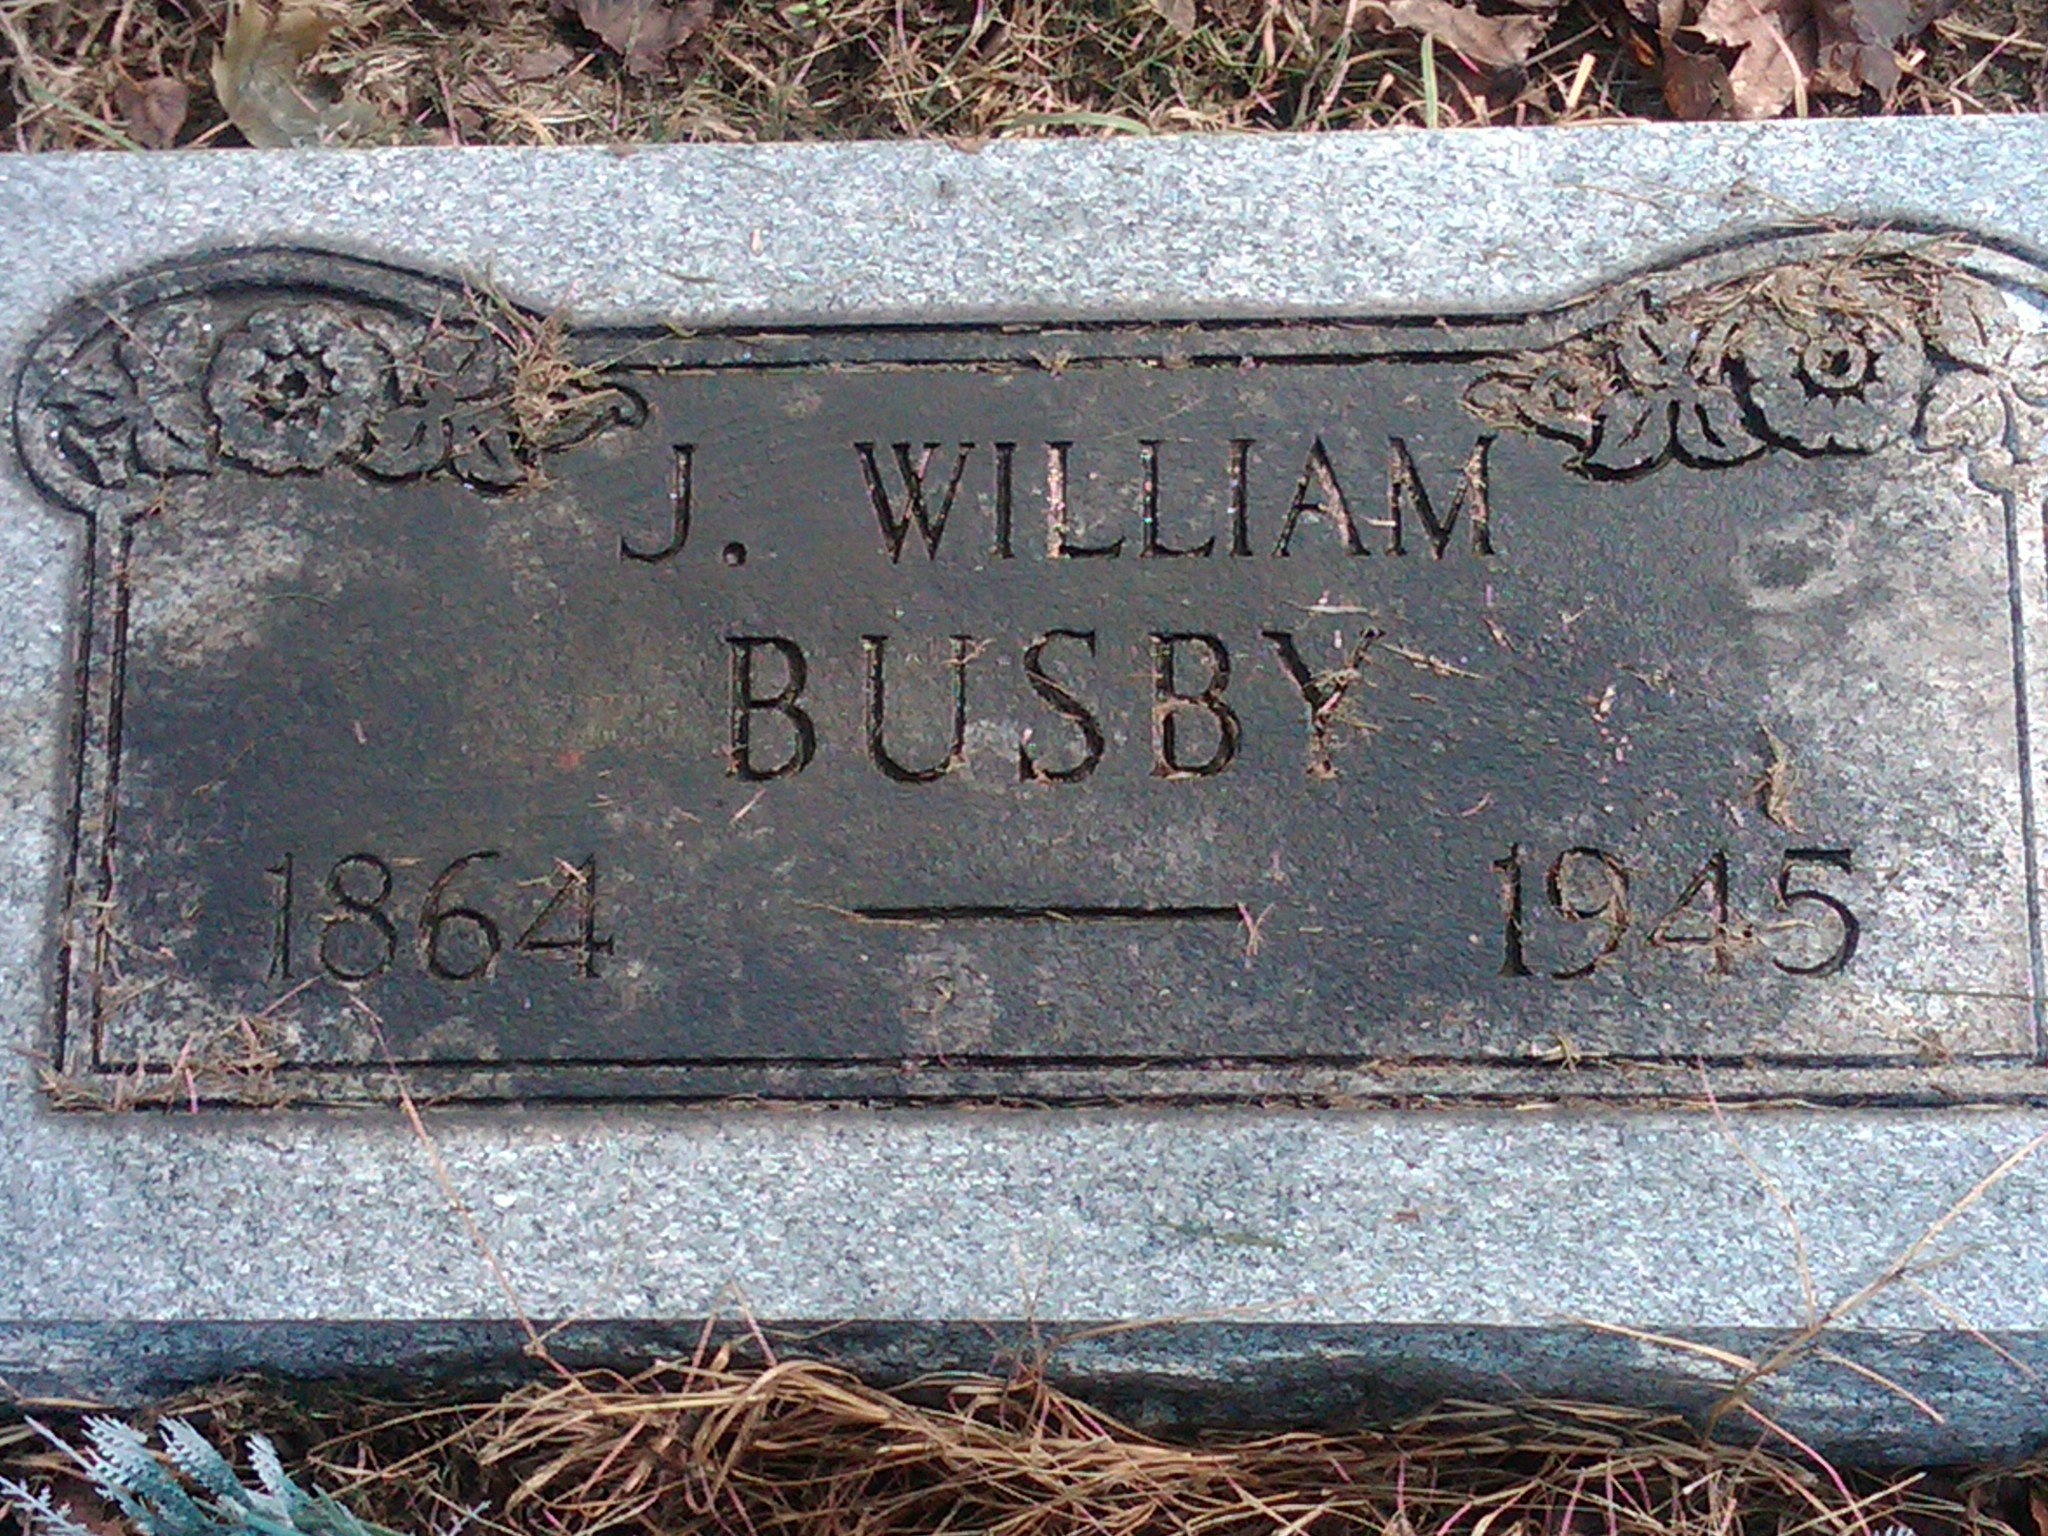 William H Busby